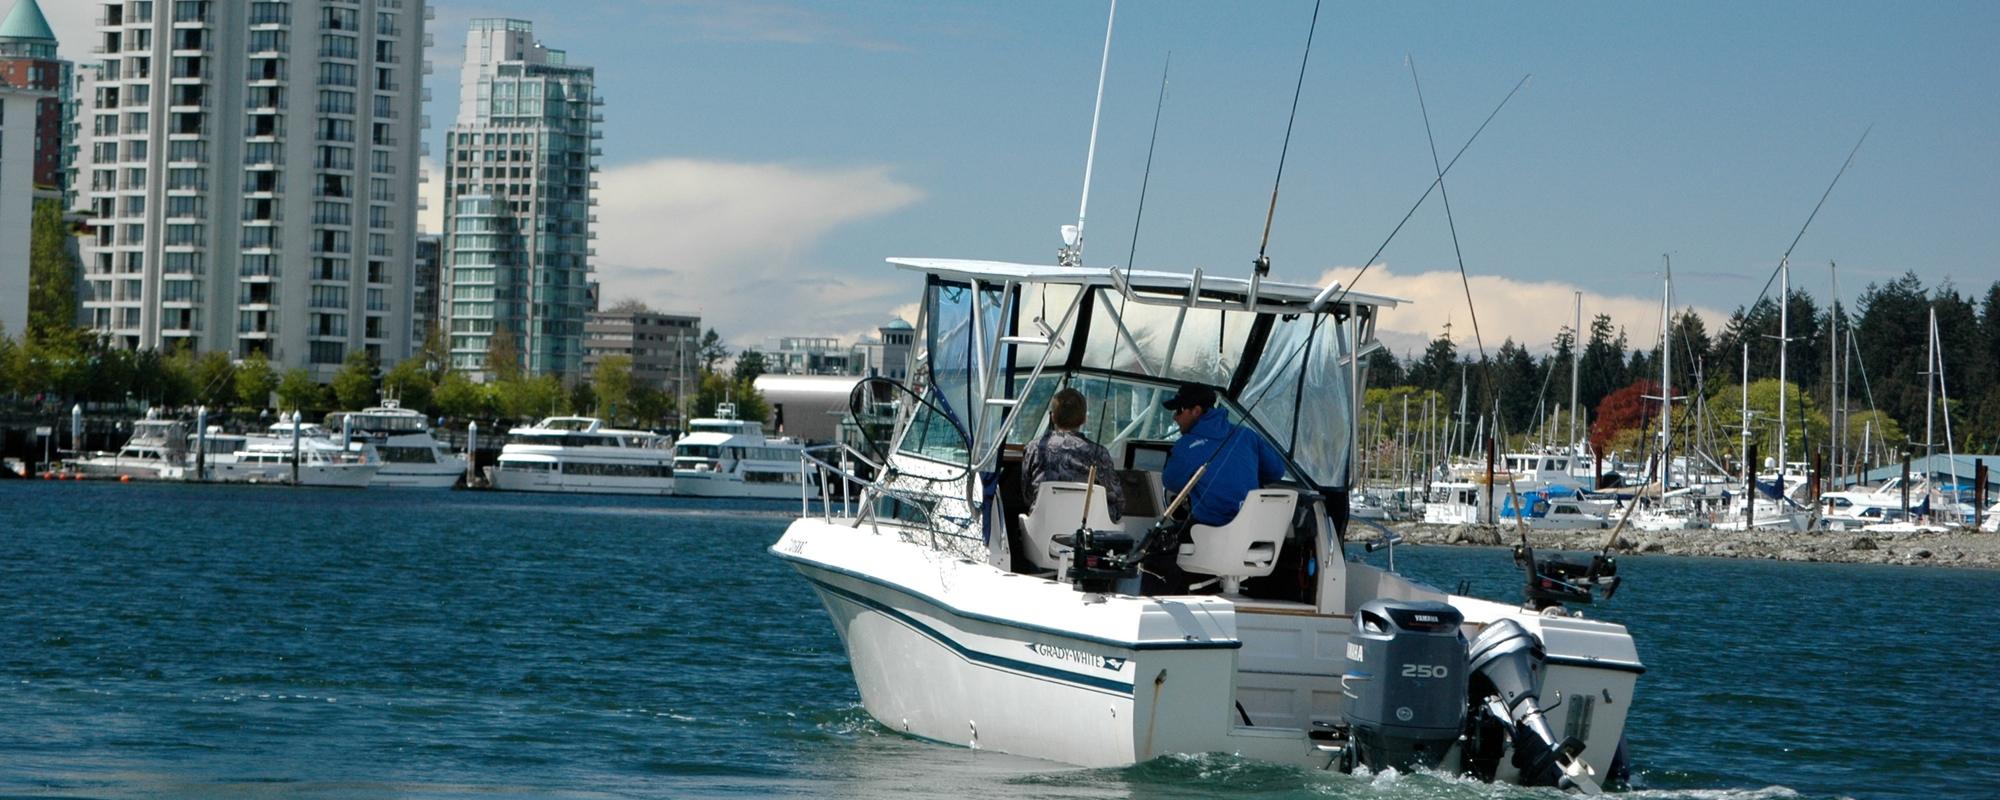 British columbia salmon fishing vancouver bc guided for Salmon fishing vancouver